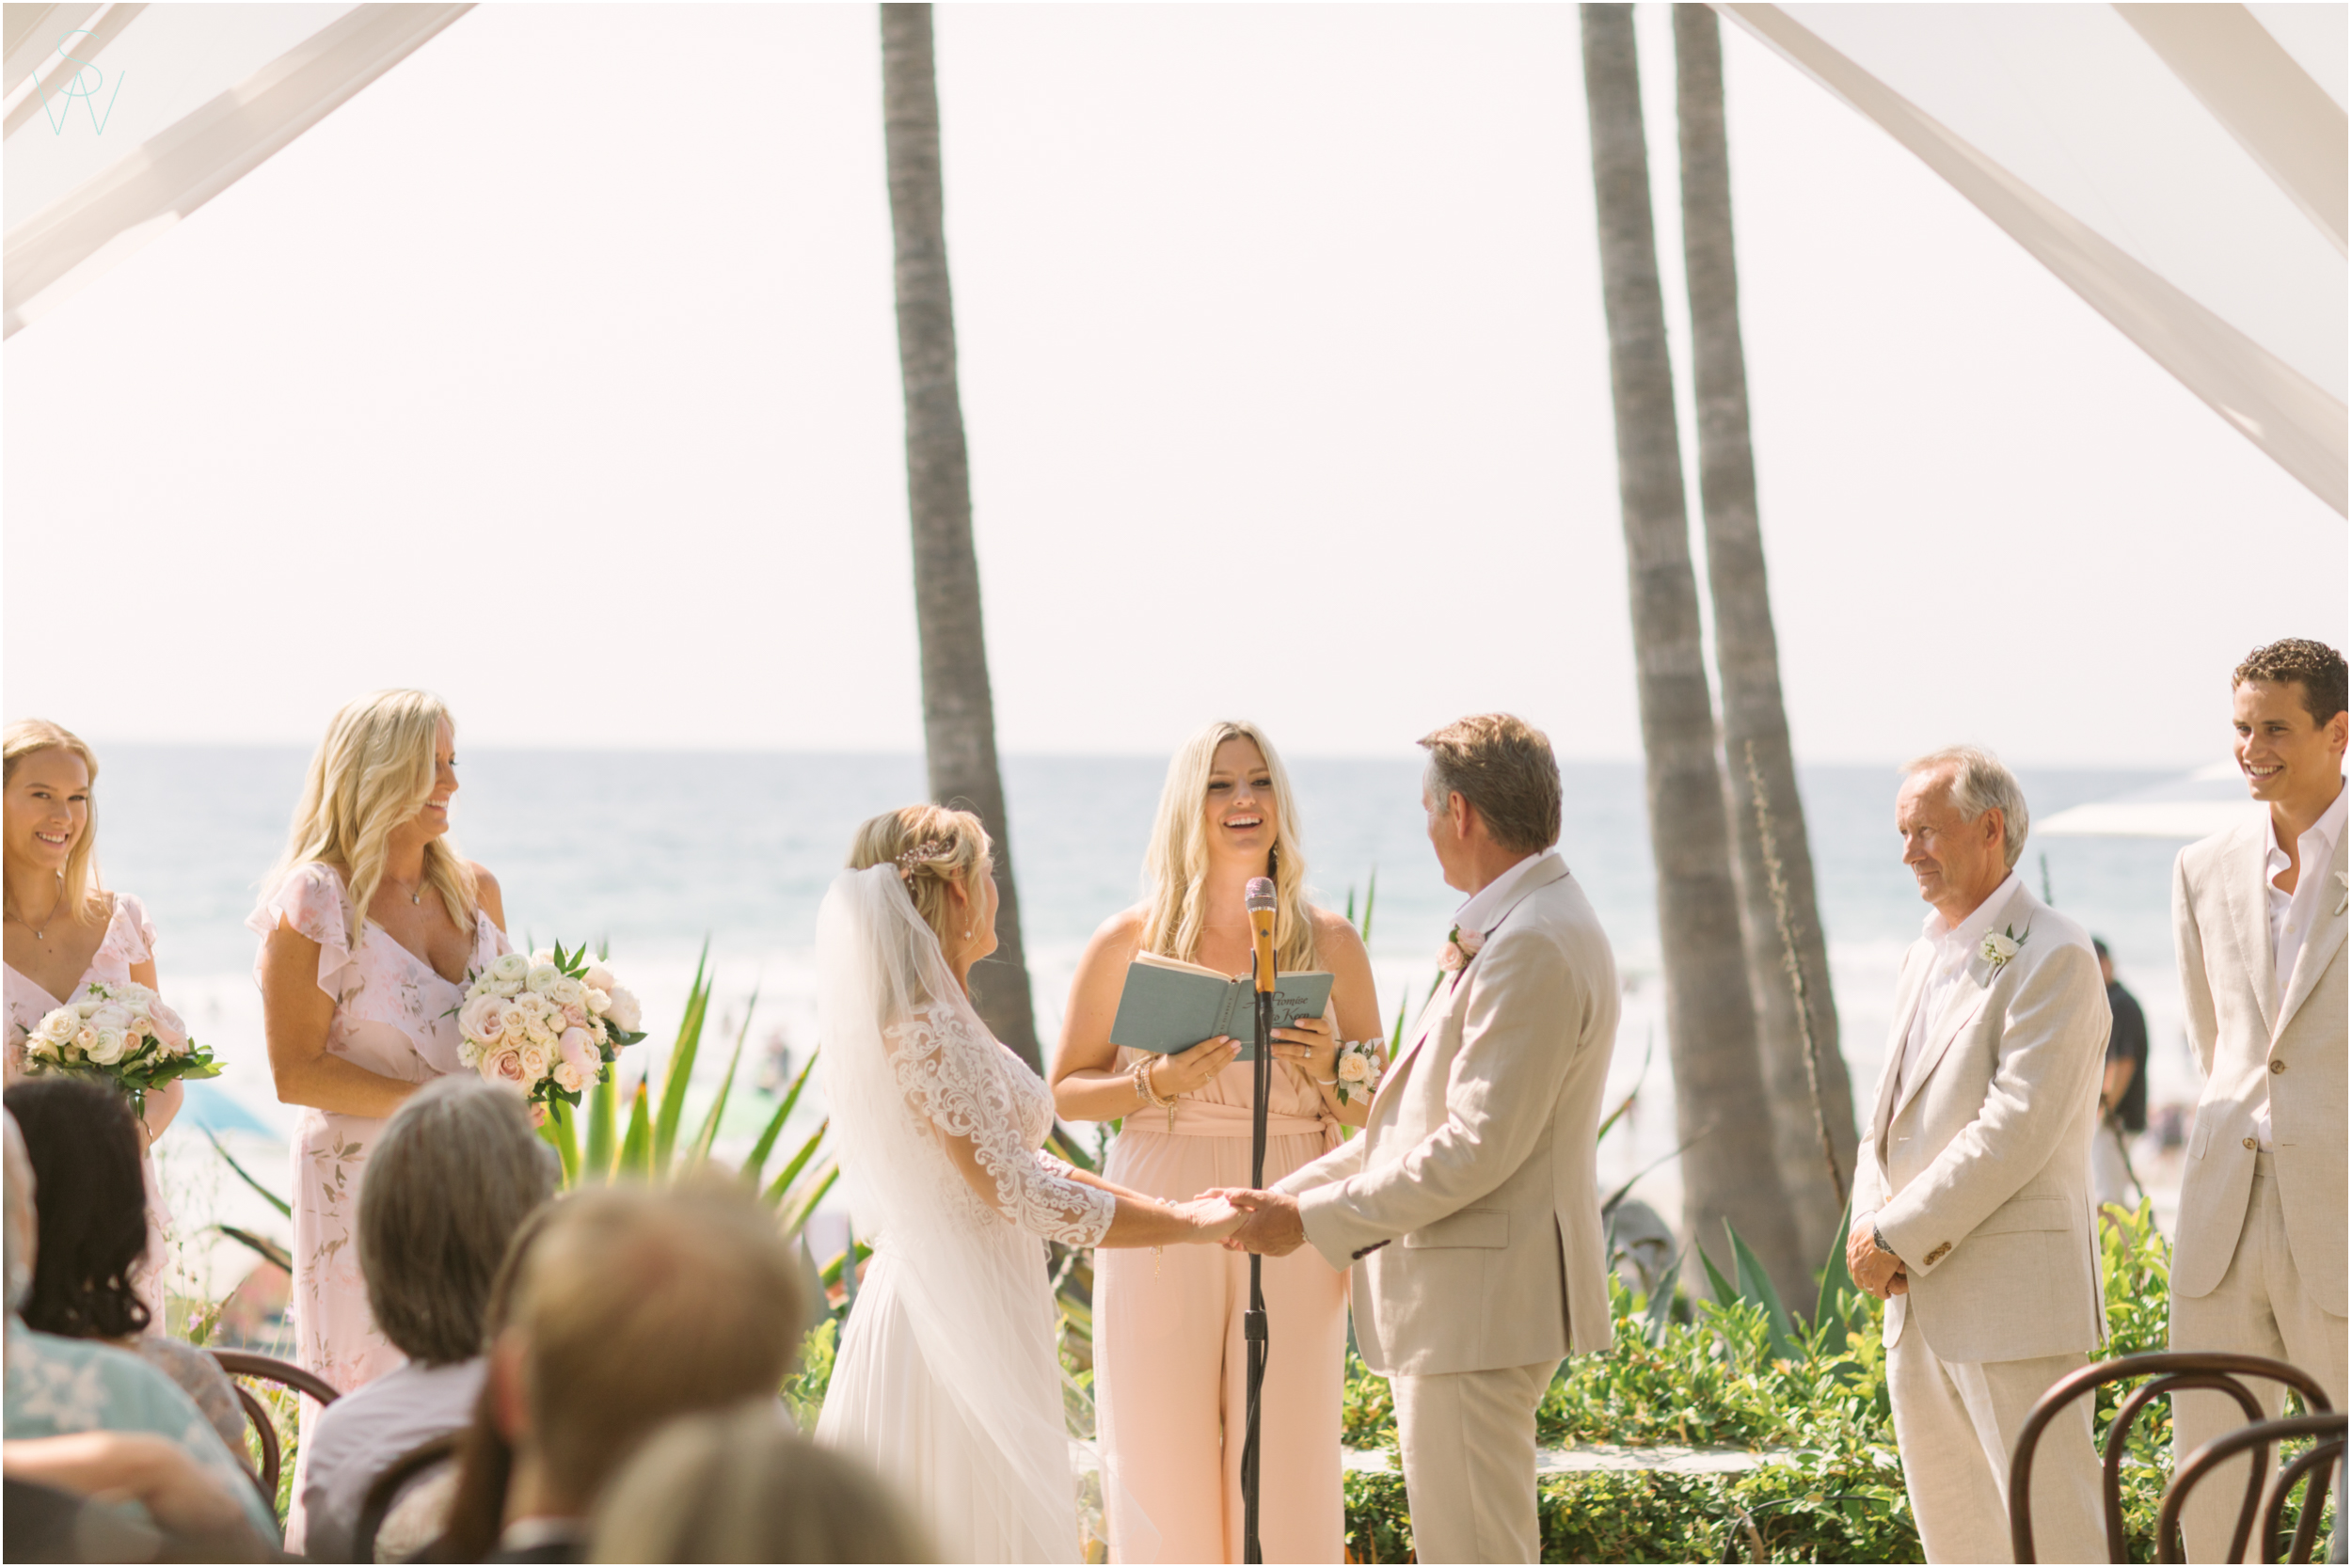 111DEL.MAR.WEDDINGS.Ceremony.photography.shewanders.JPG